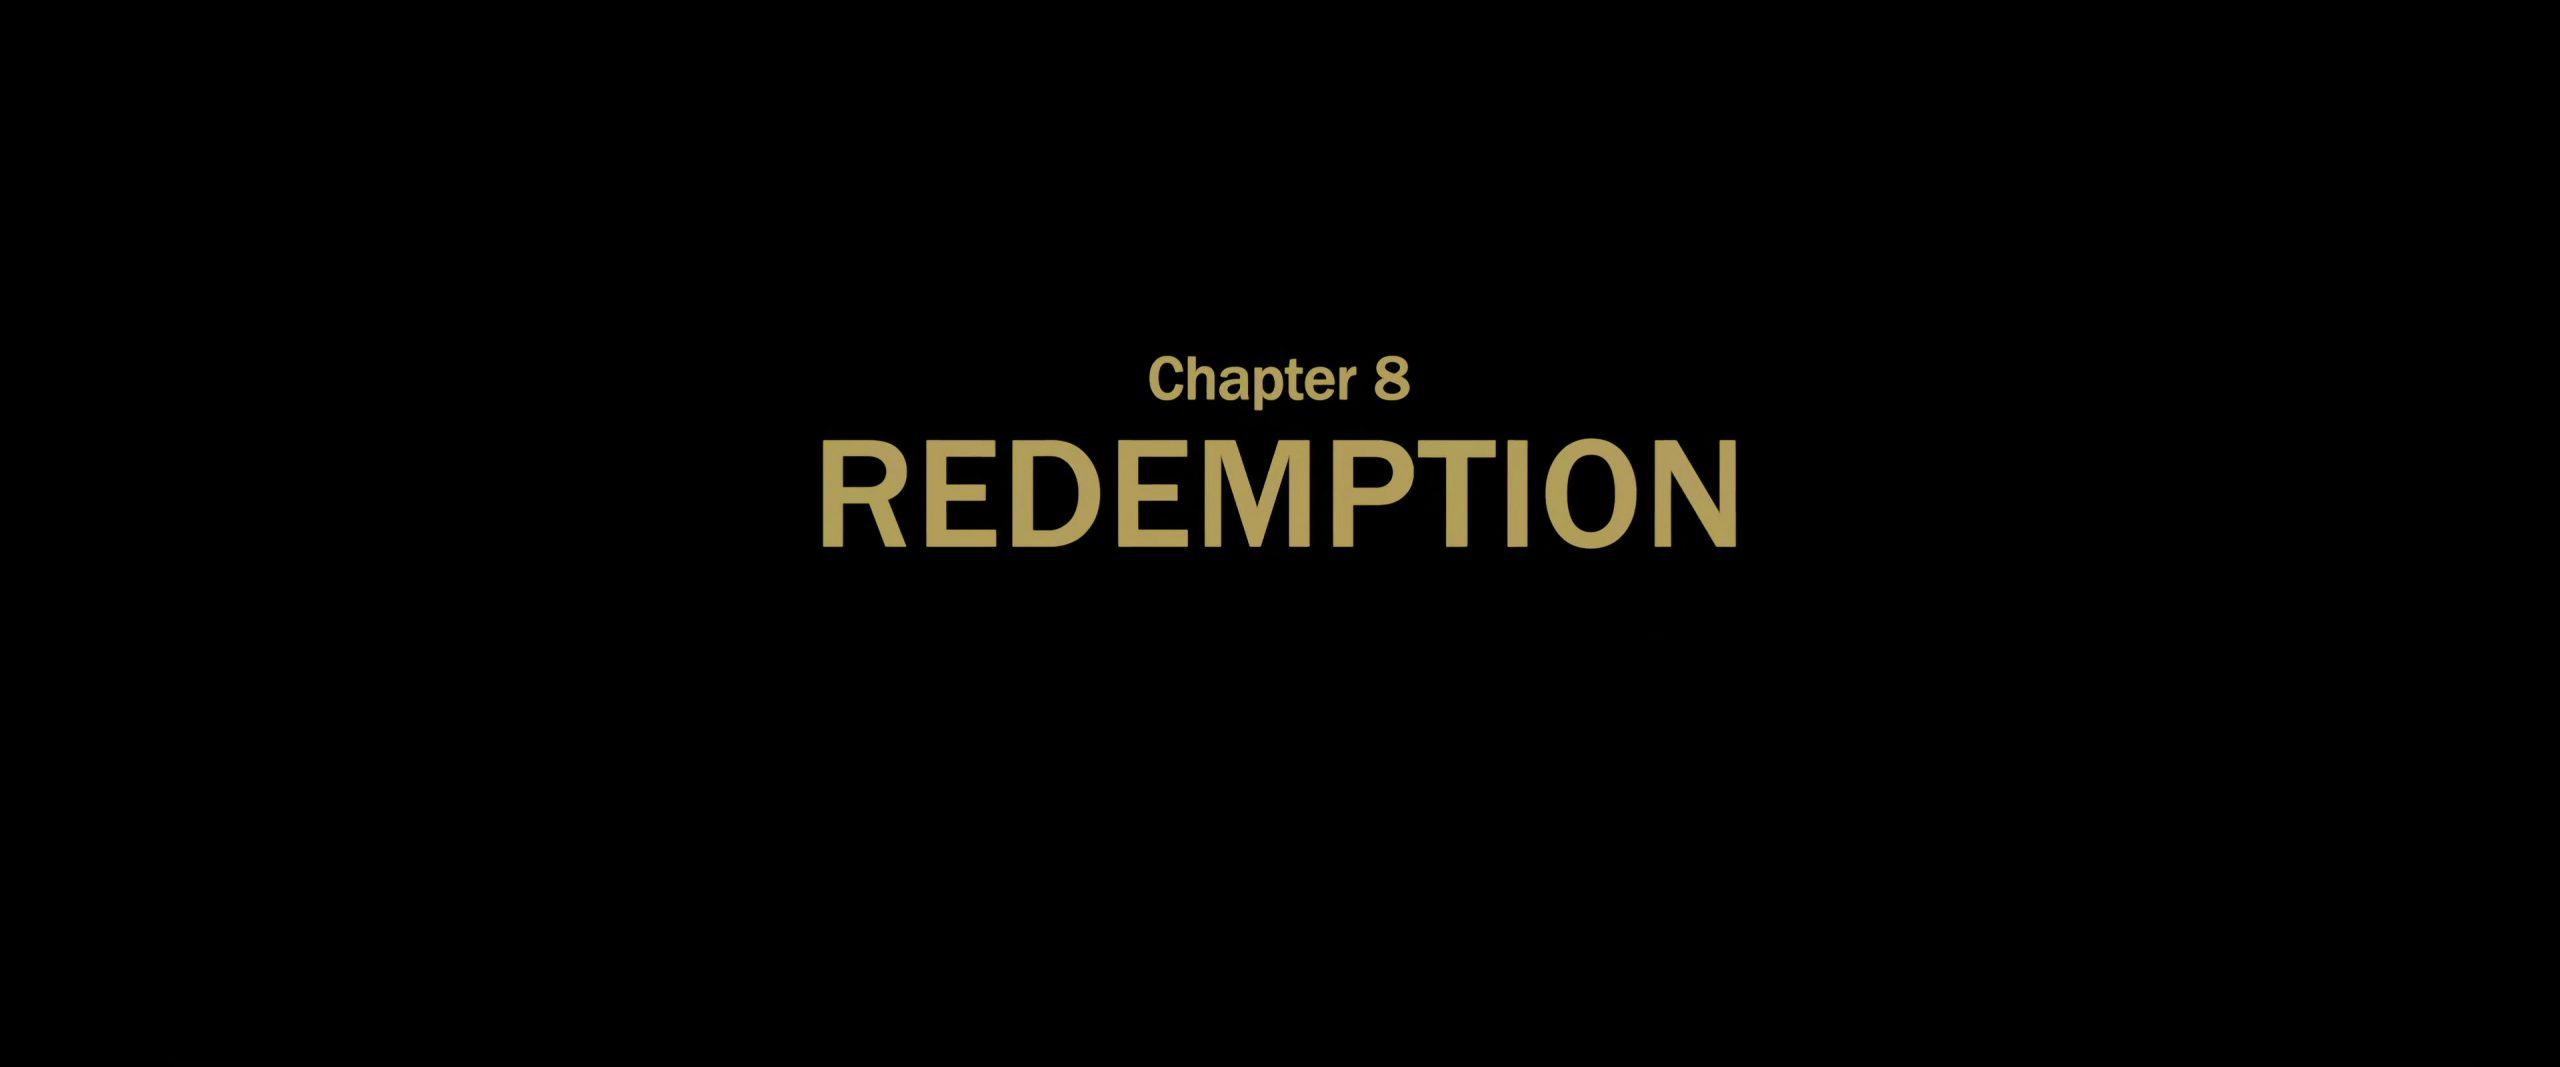 4k The Mandalorian S01e08 Chapter 8 Redemption Starwars Screencaps Com